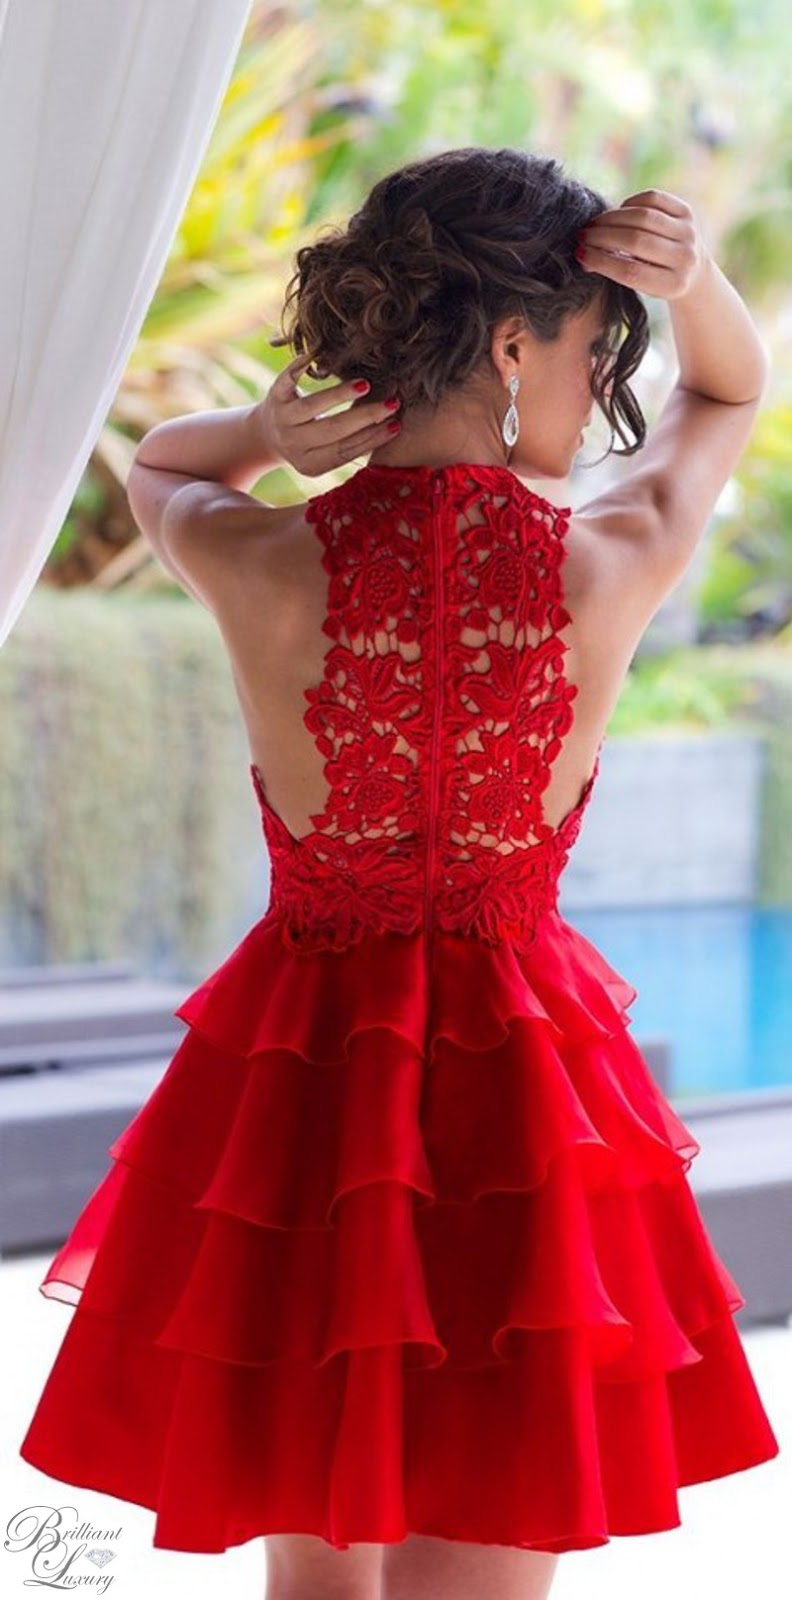 Brilliant Luxury ♦ Silvia Navarro Magnolia Dress